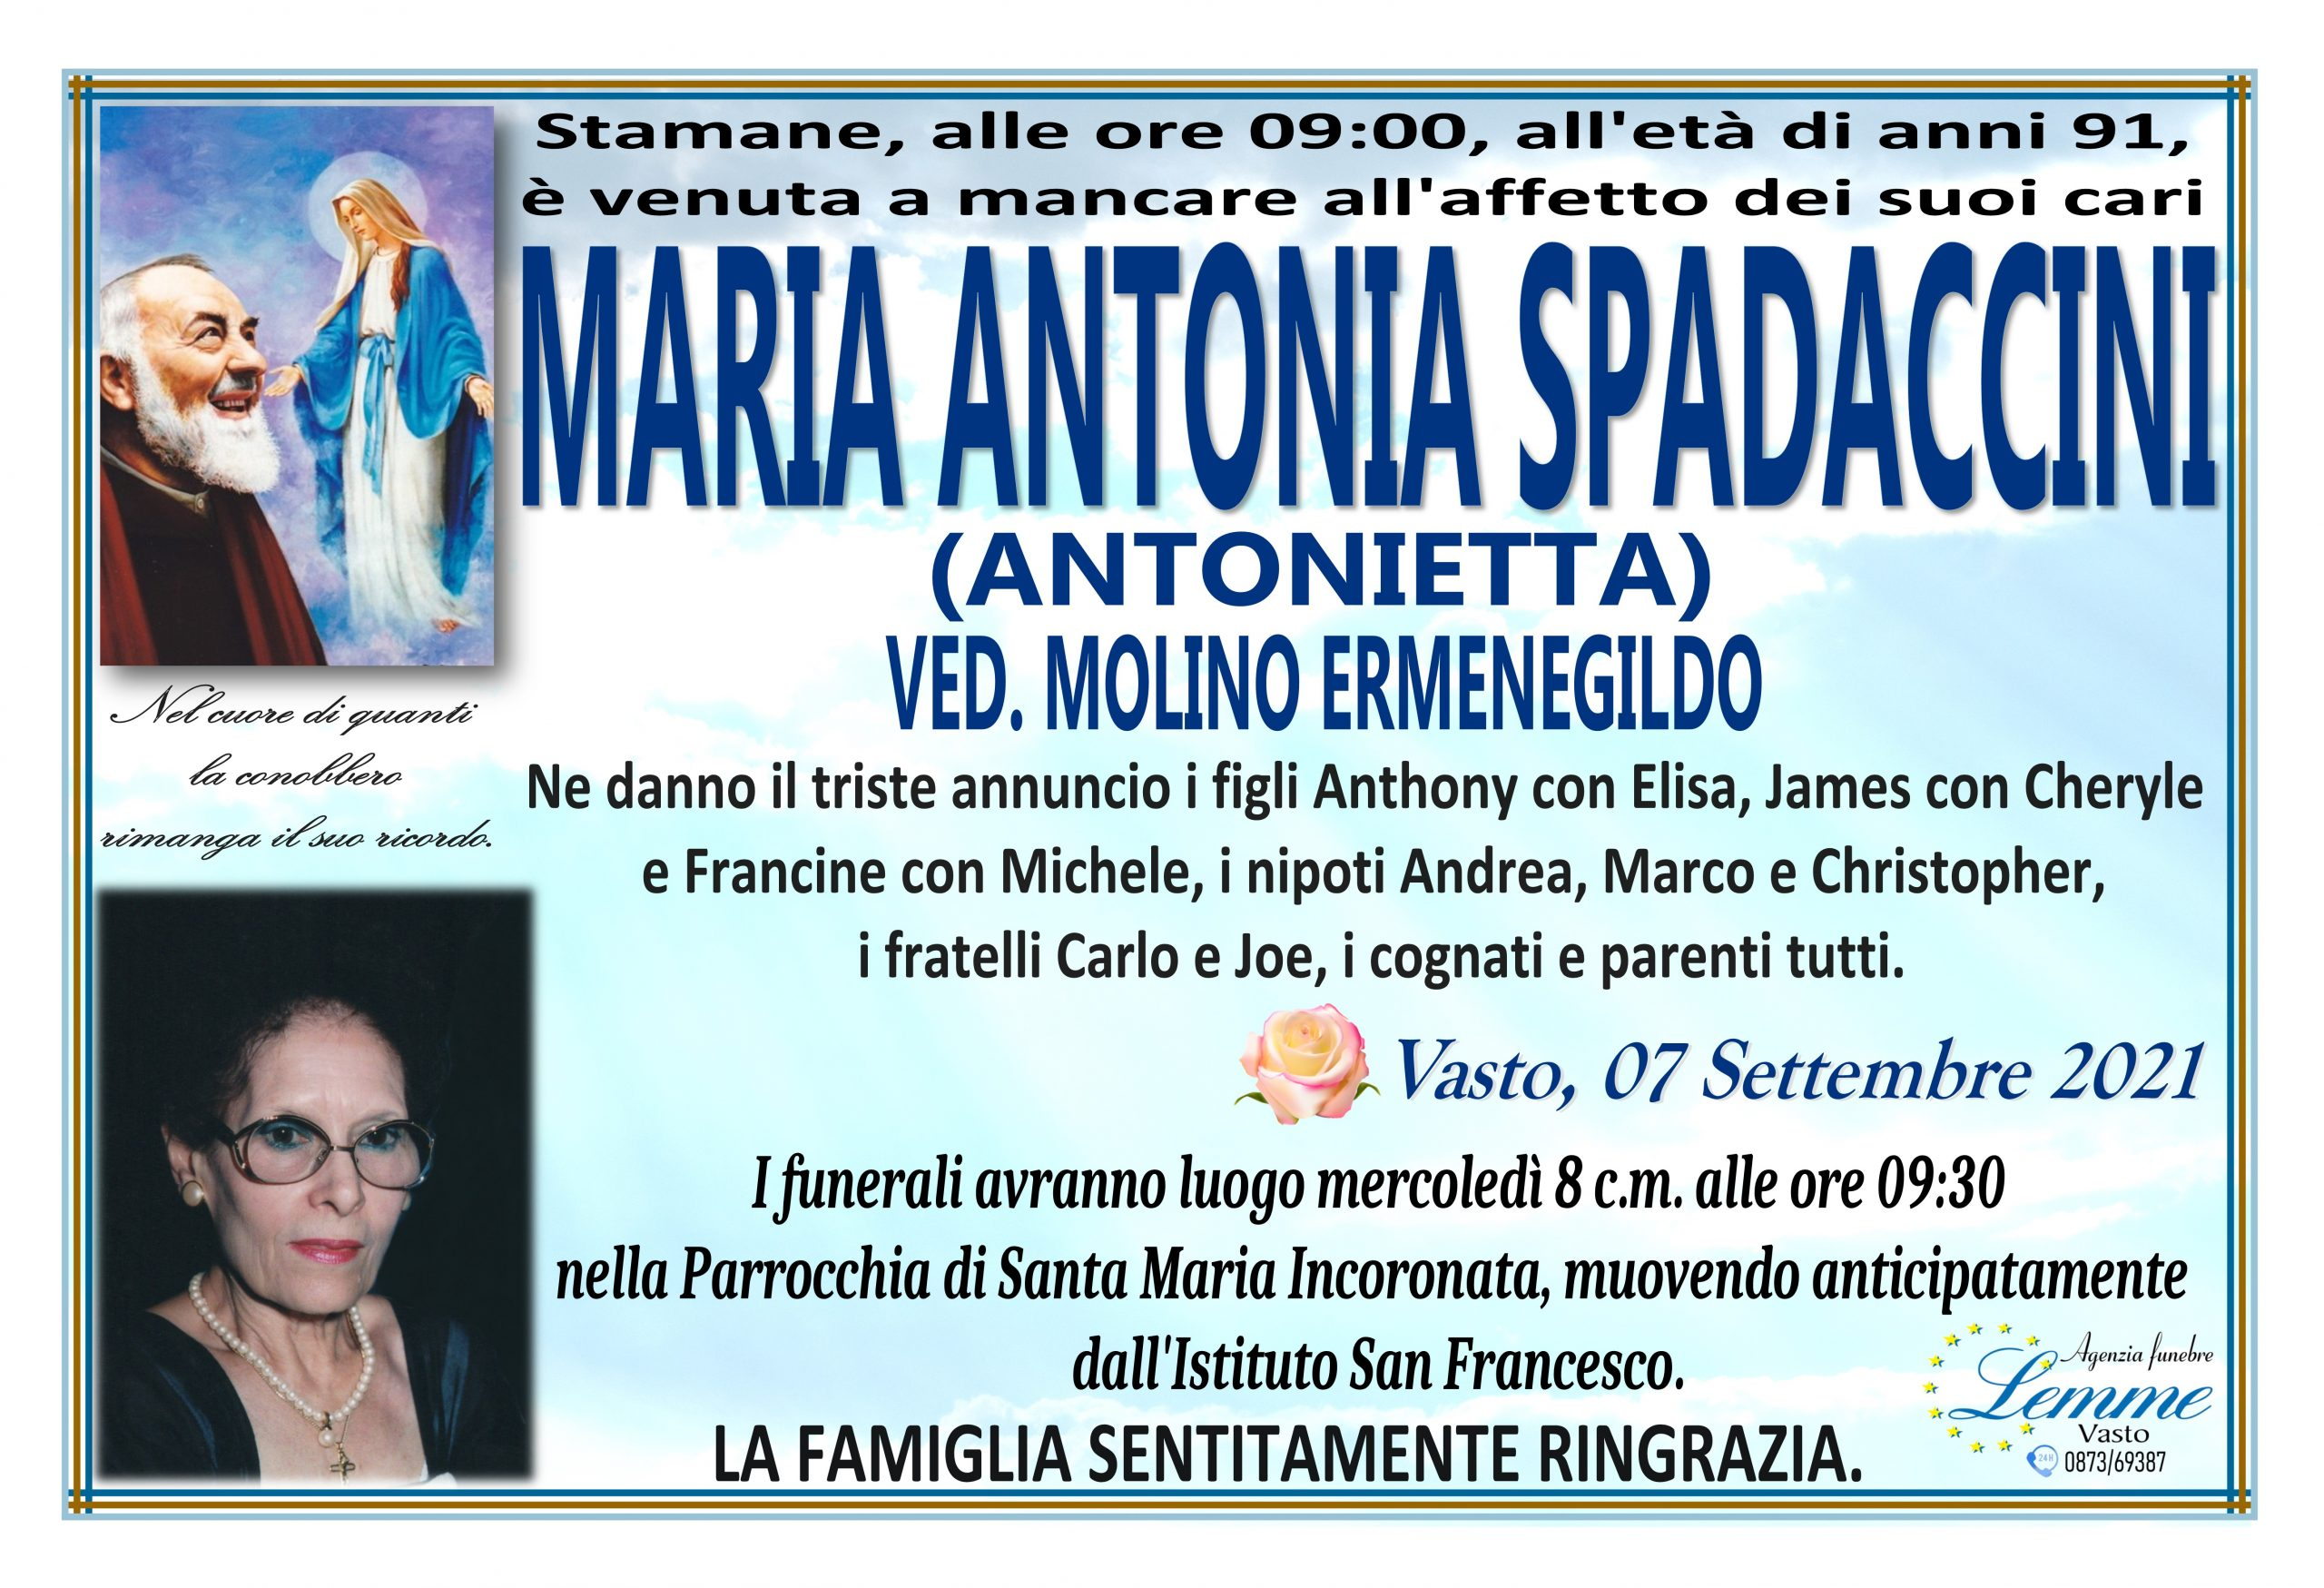 MARIA ANTONIA SPADACCINI